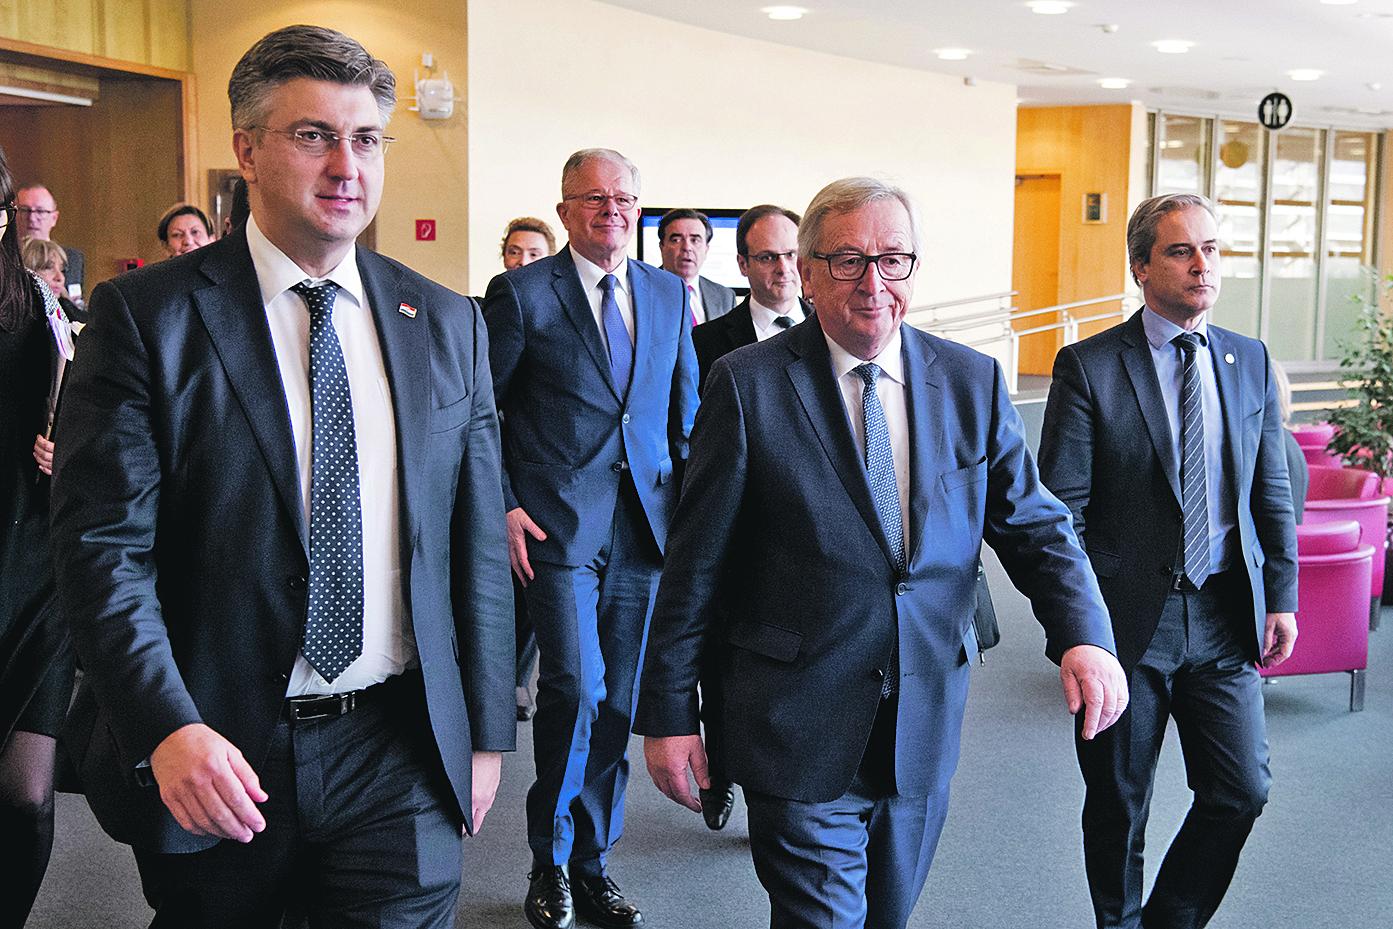 Andrej Plenković, Jean-Claude Juncker